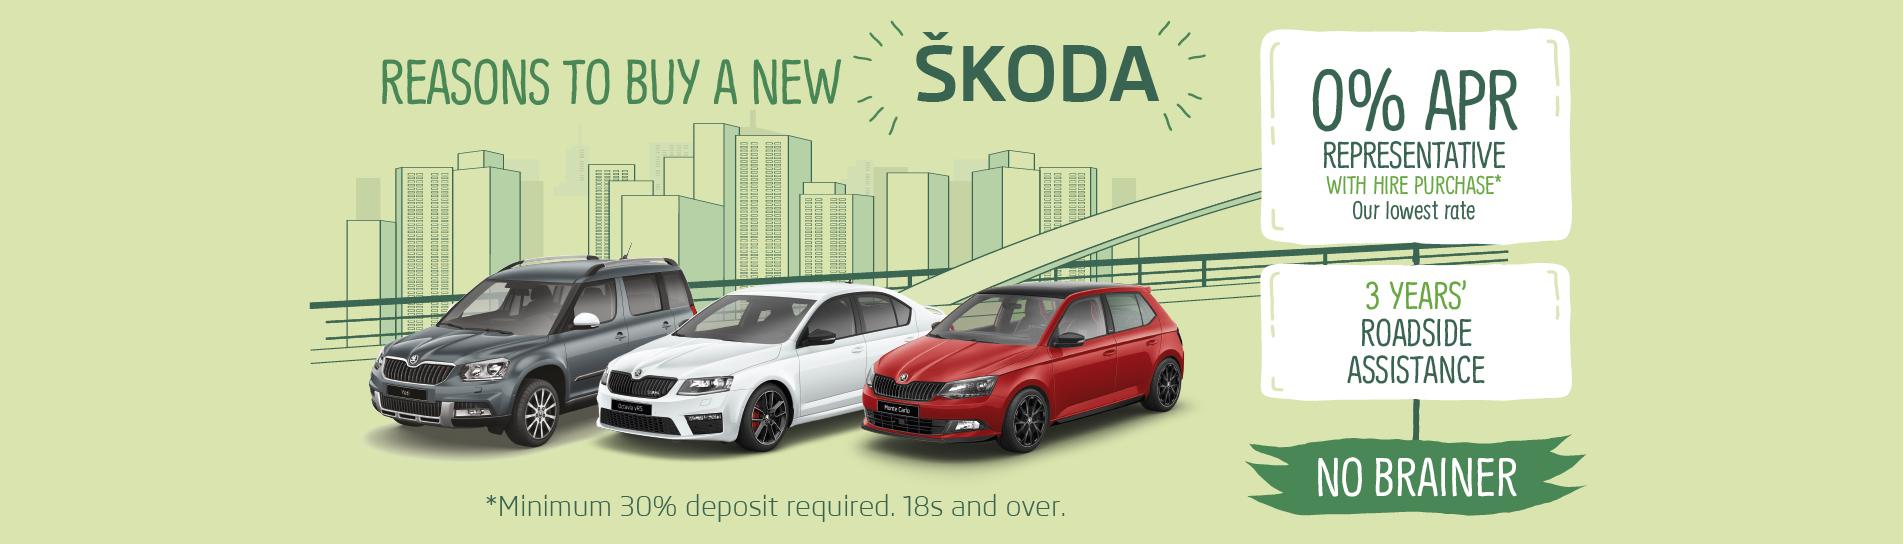 hire purchase new car latest offers robert eardley koda. Black Bedroom Furniture Sets. Home Design Ideas